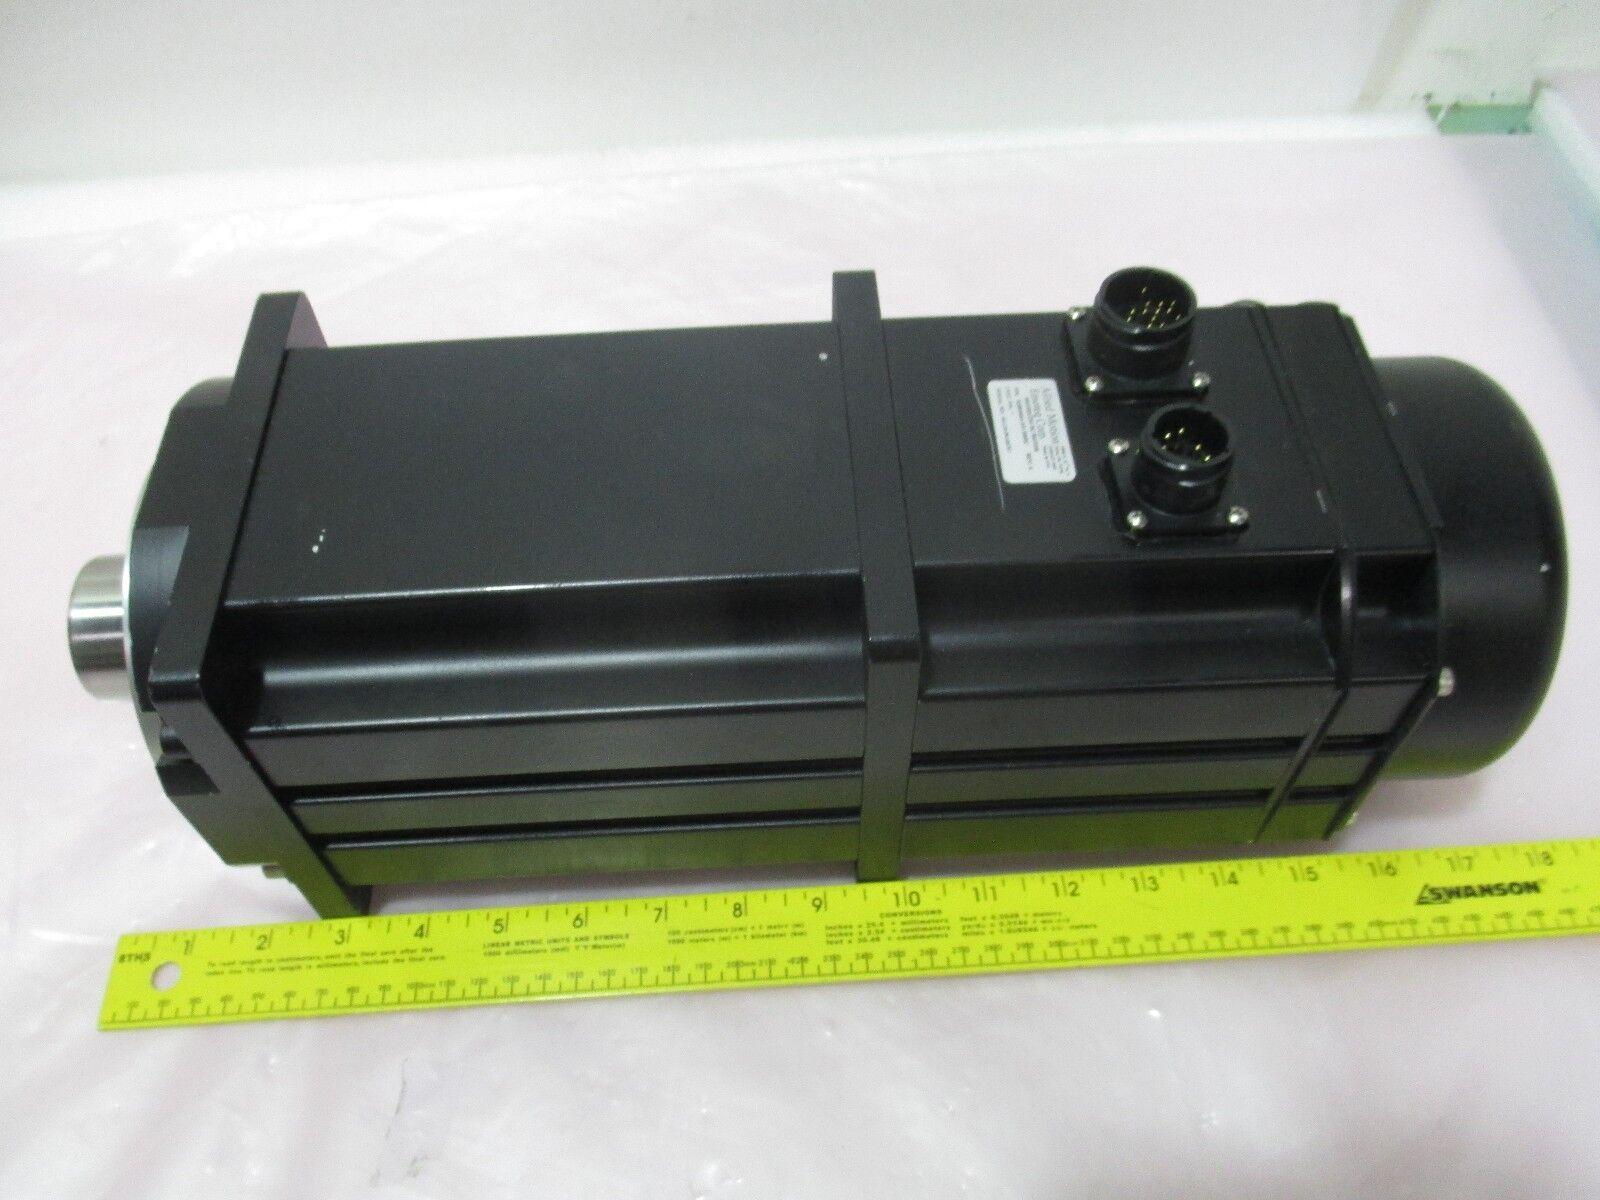 Allied Motion DC Brushless Motor SQB05603-A01-HBRC, Servo, 422251